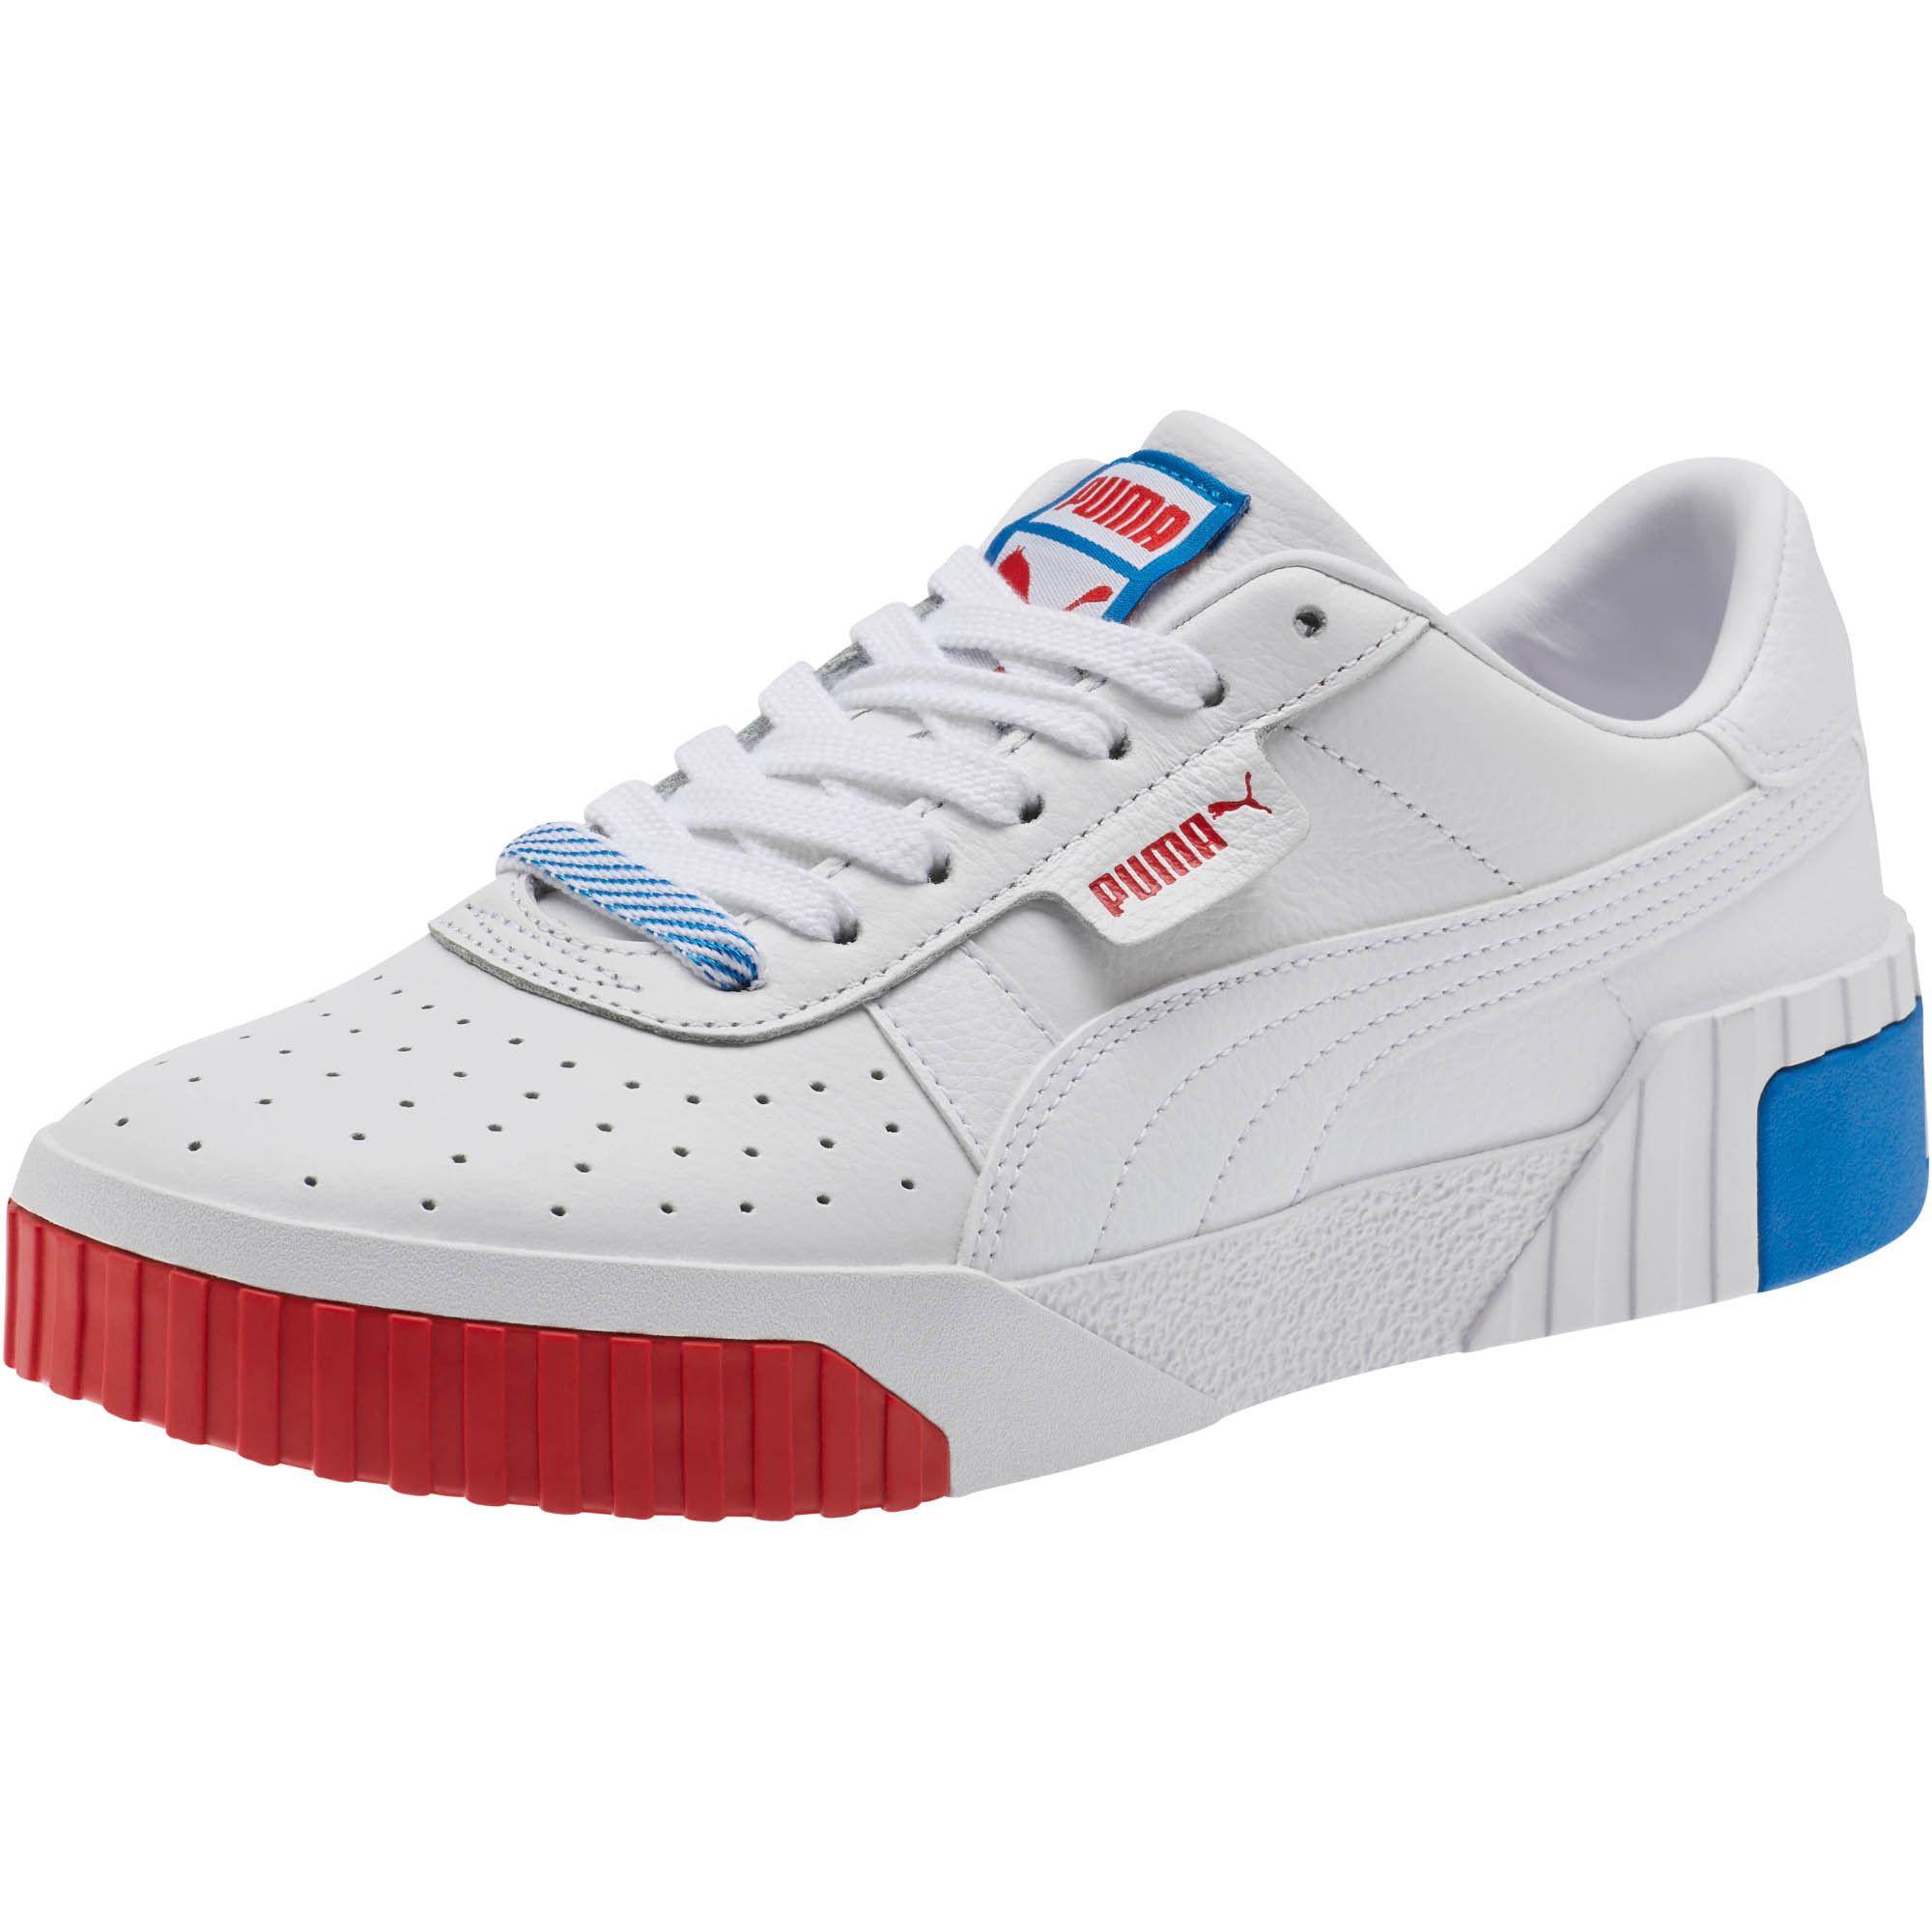 Womens sneakers, Sneakers, Classic sneakers